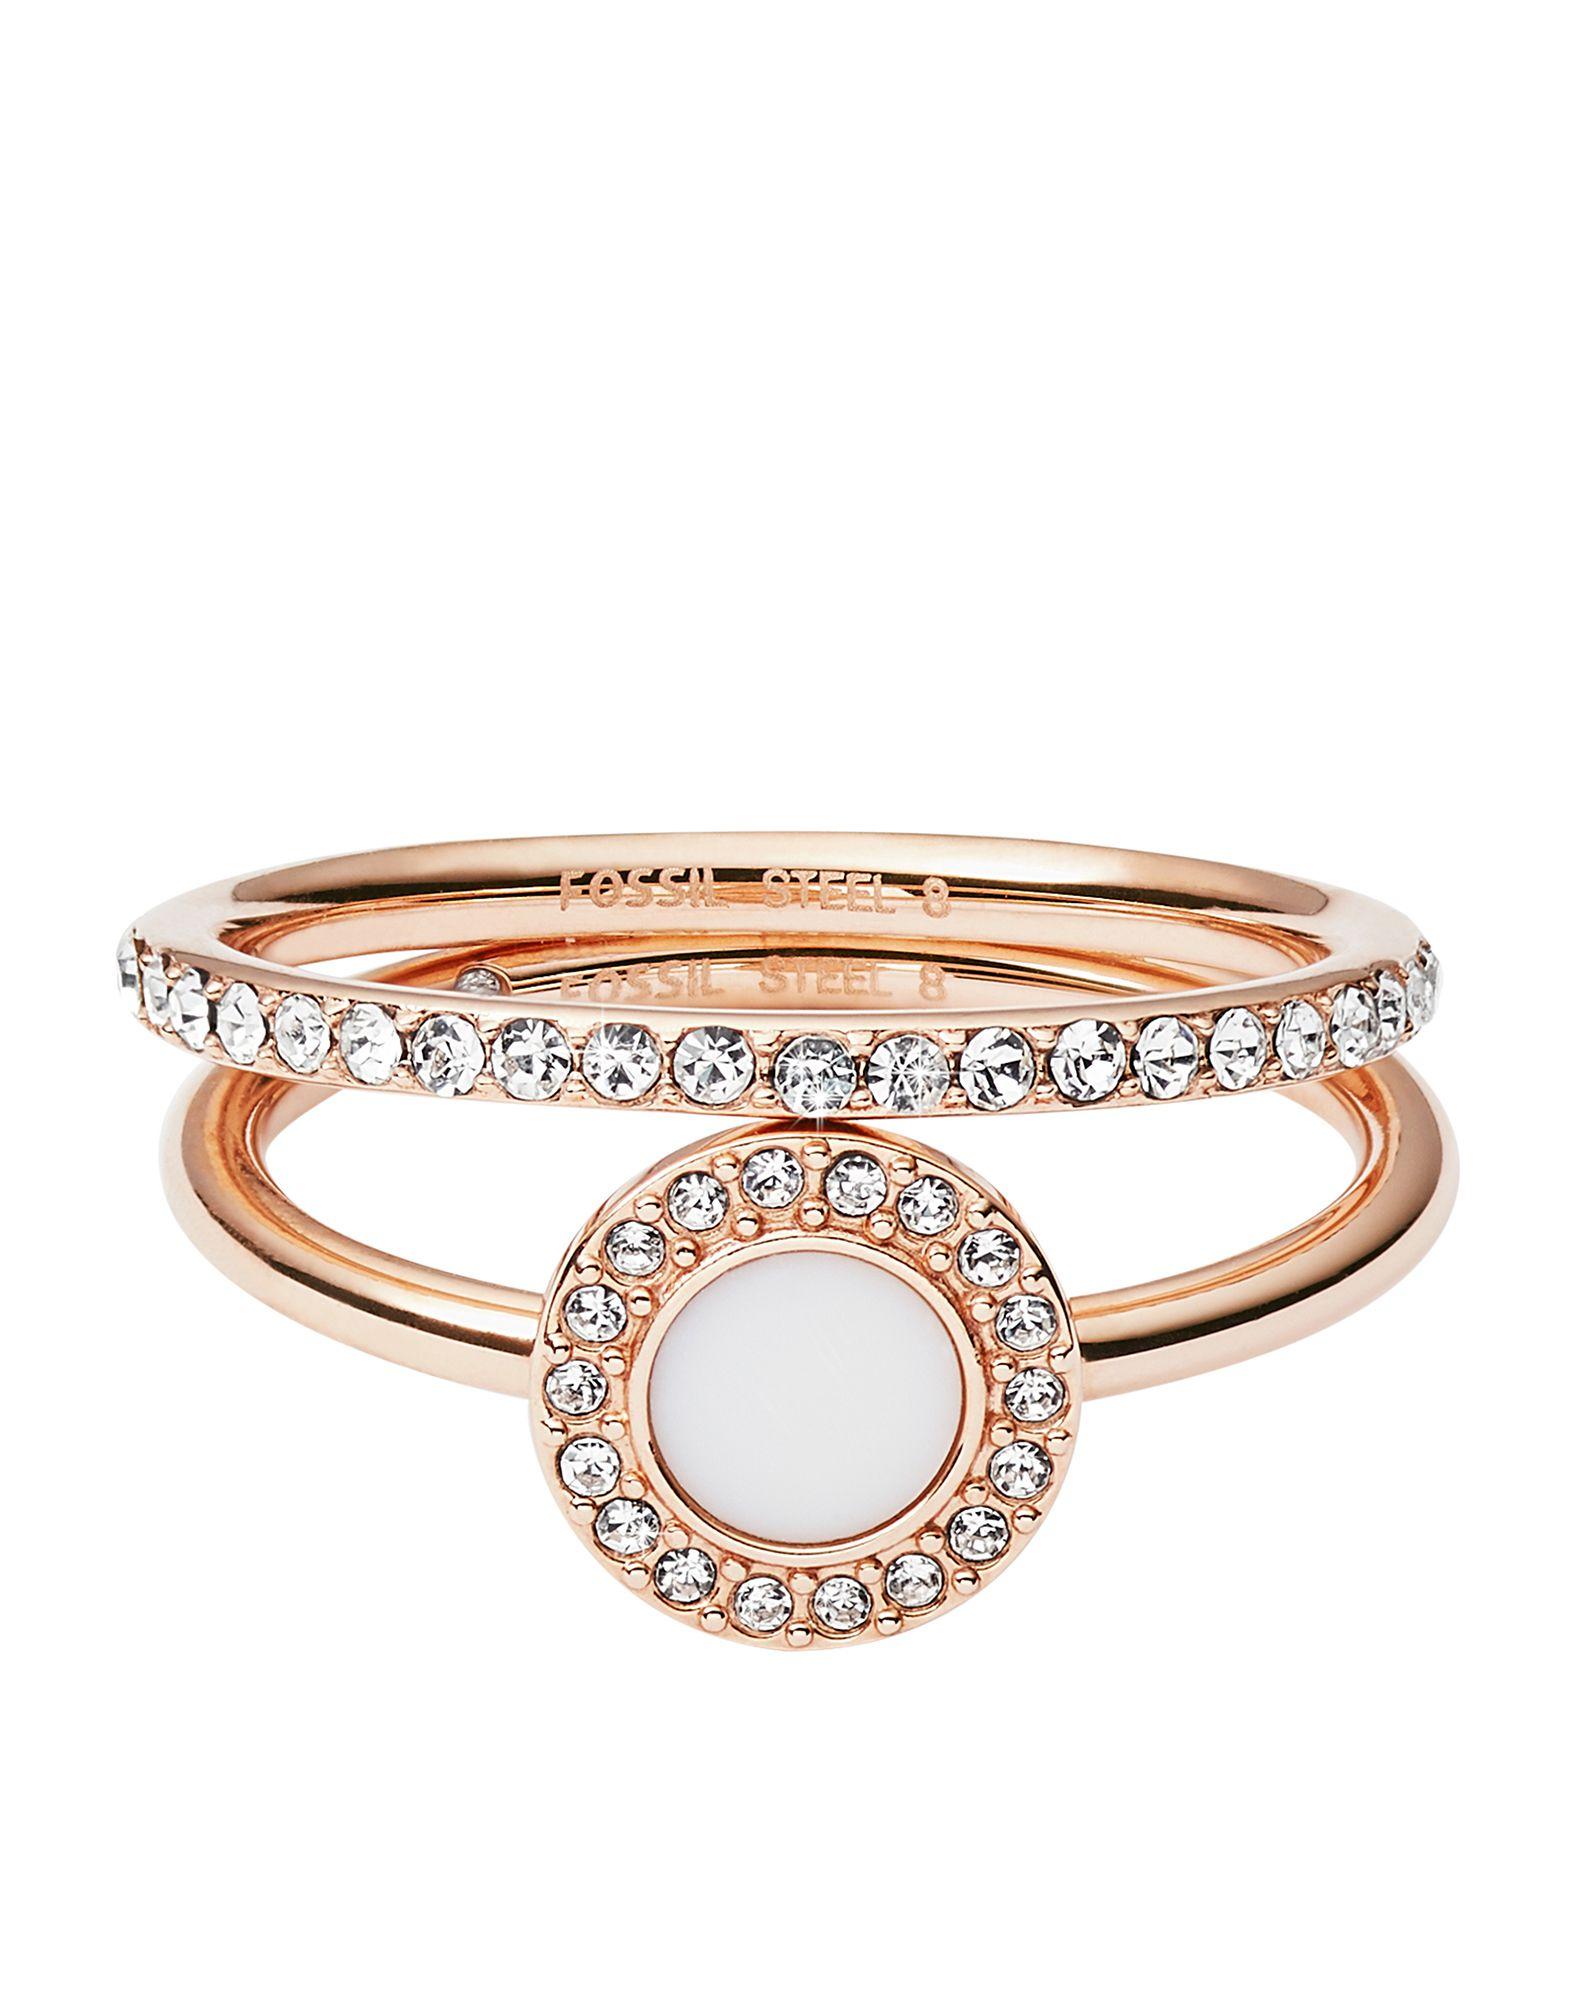 FOSSIL Damen Ring Farbe Kupfer Größe 15